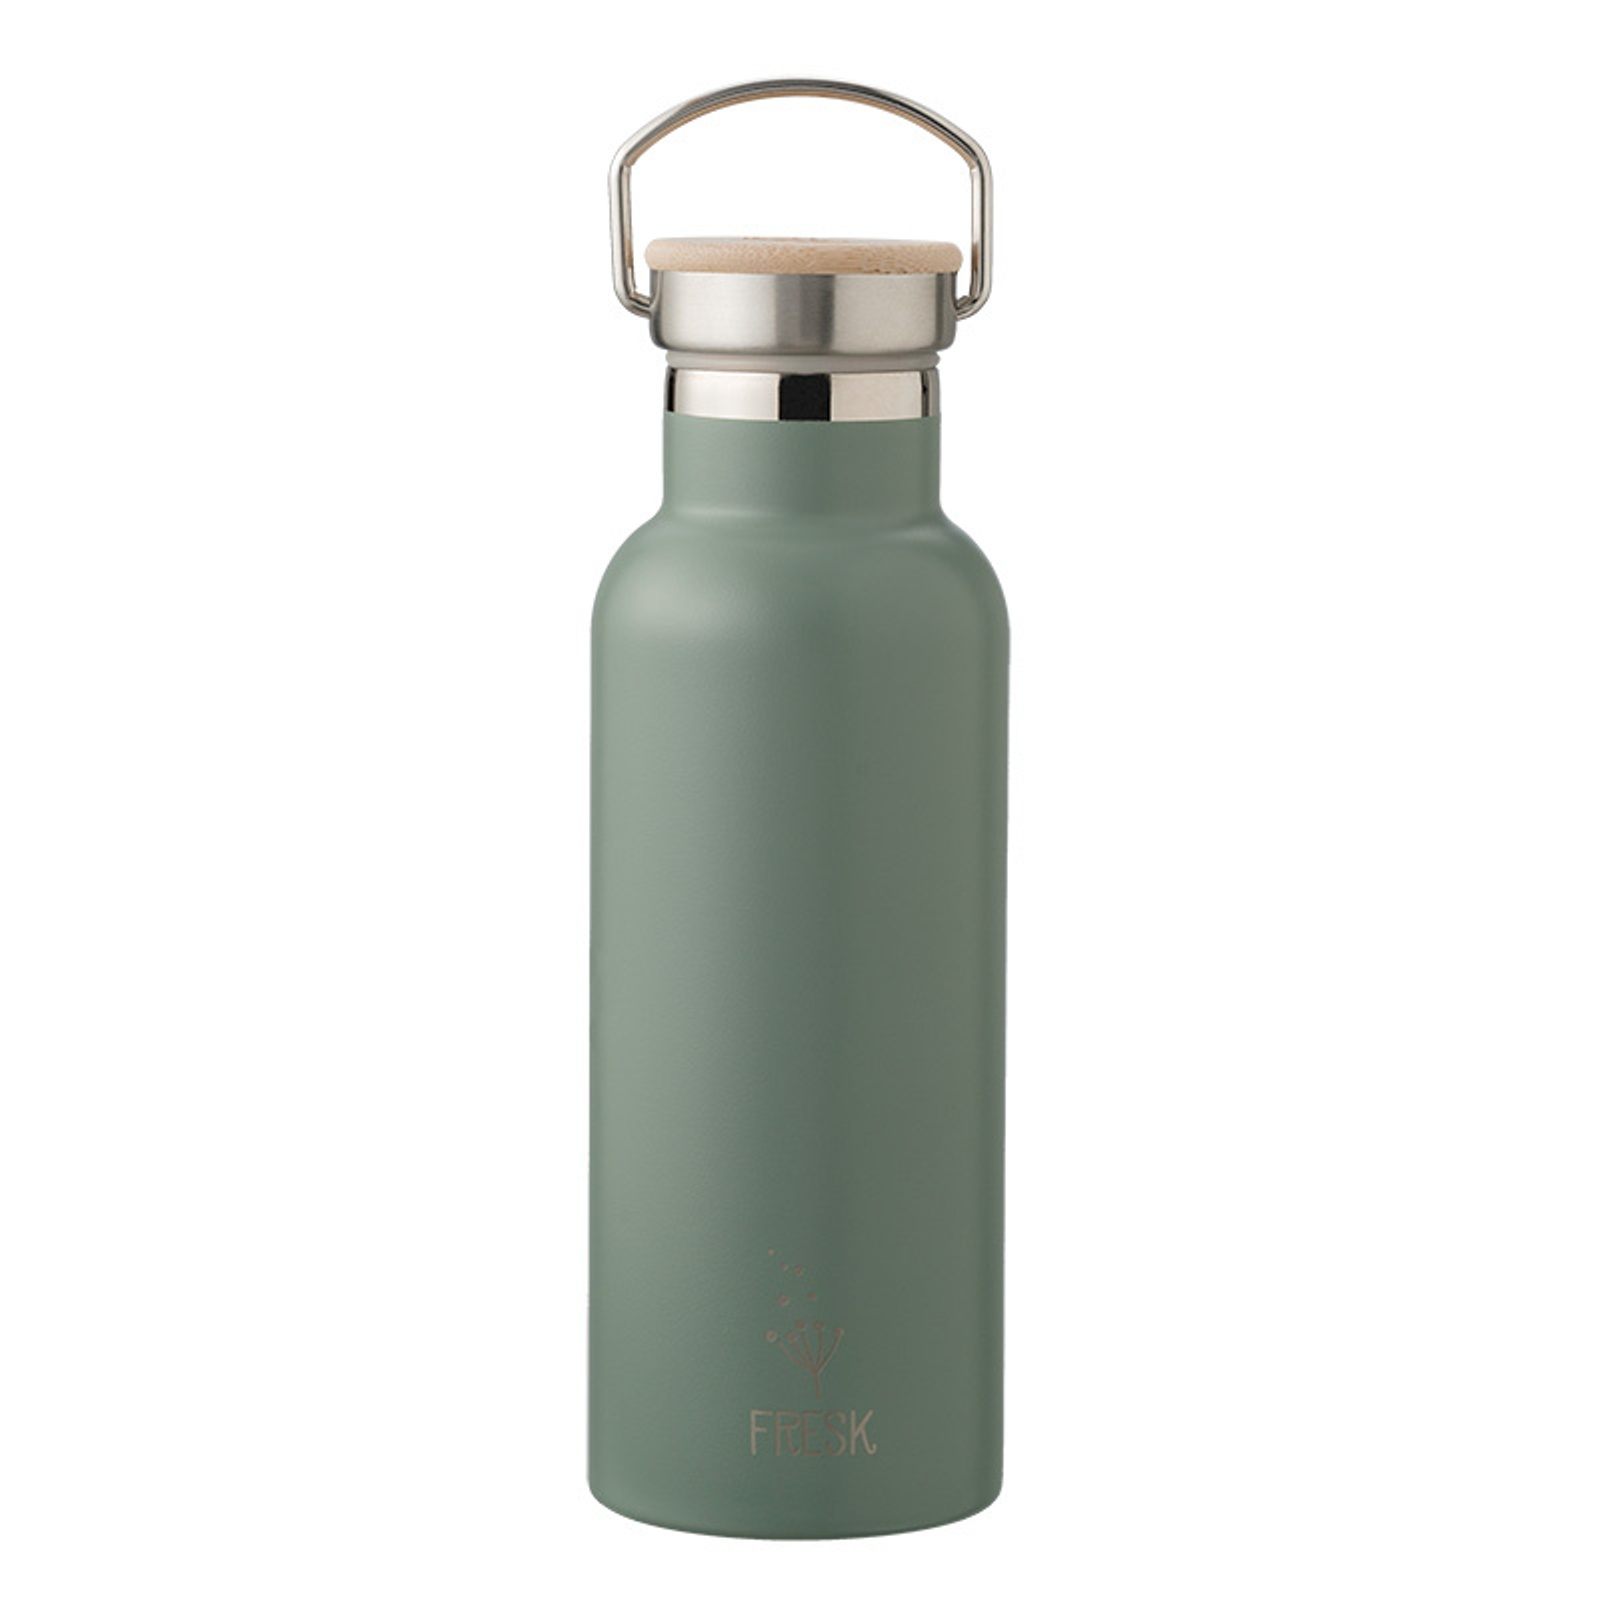 Fresk Thermosflasche Edelstahl 500ml green